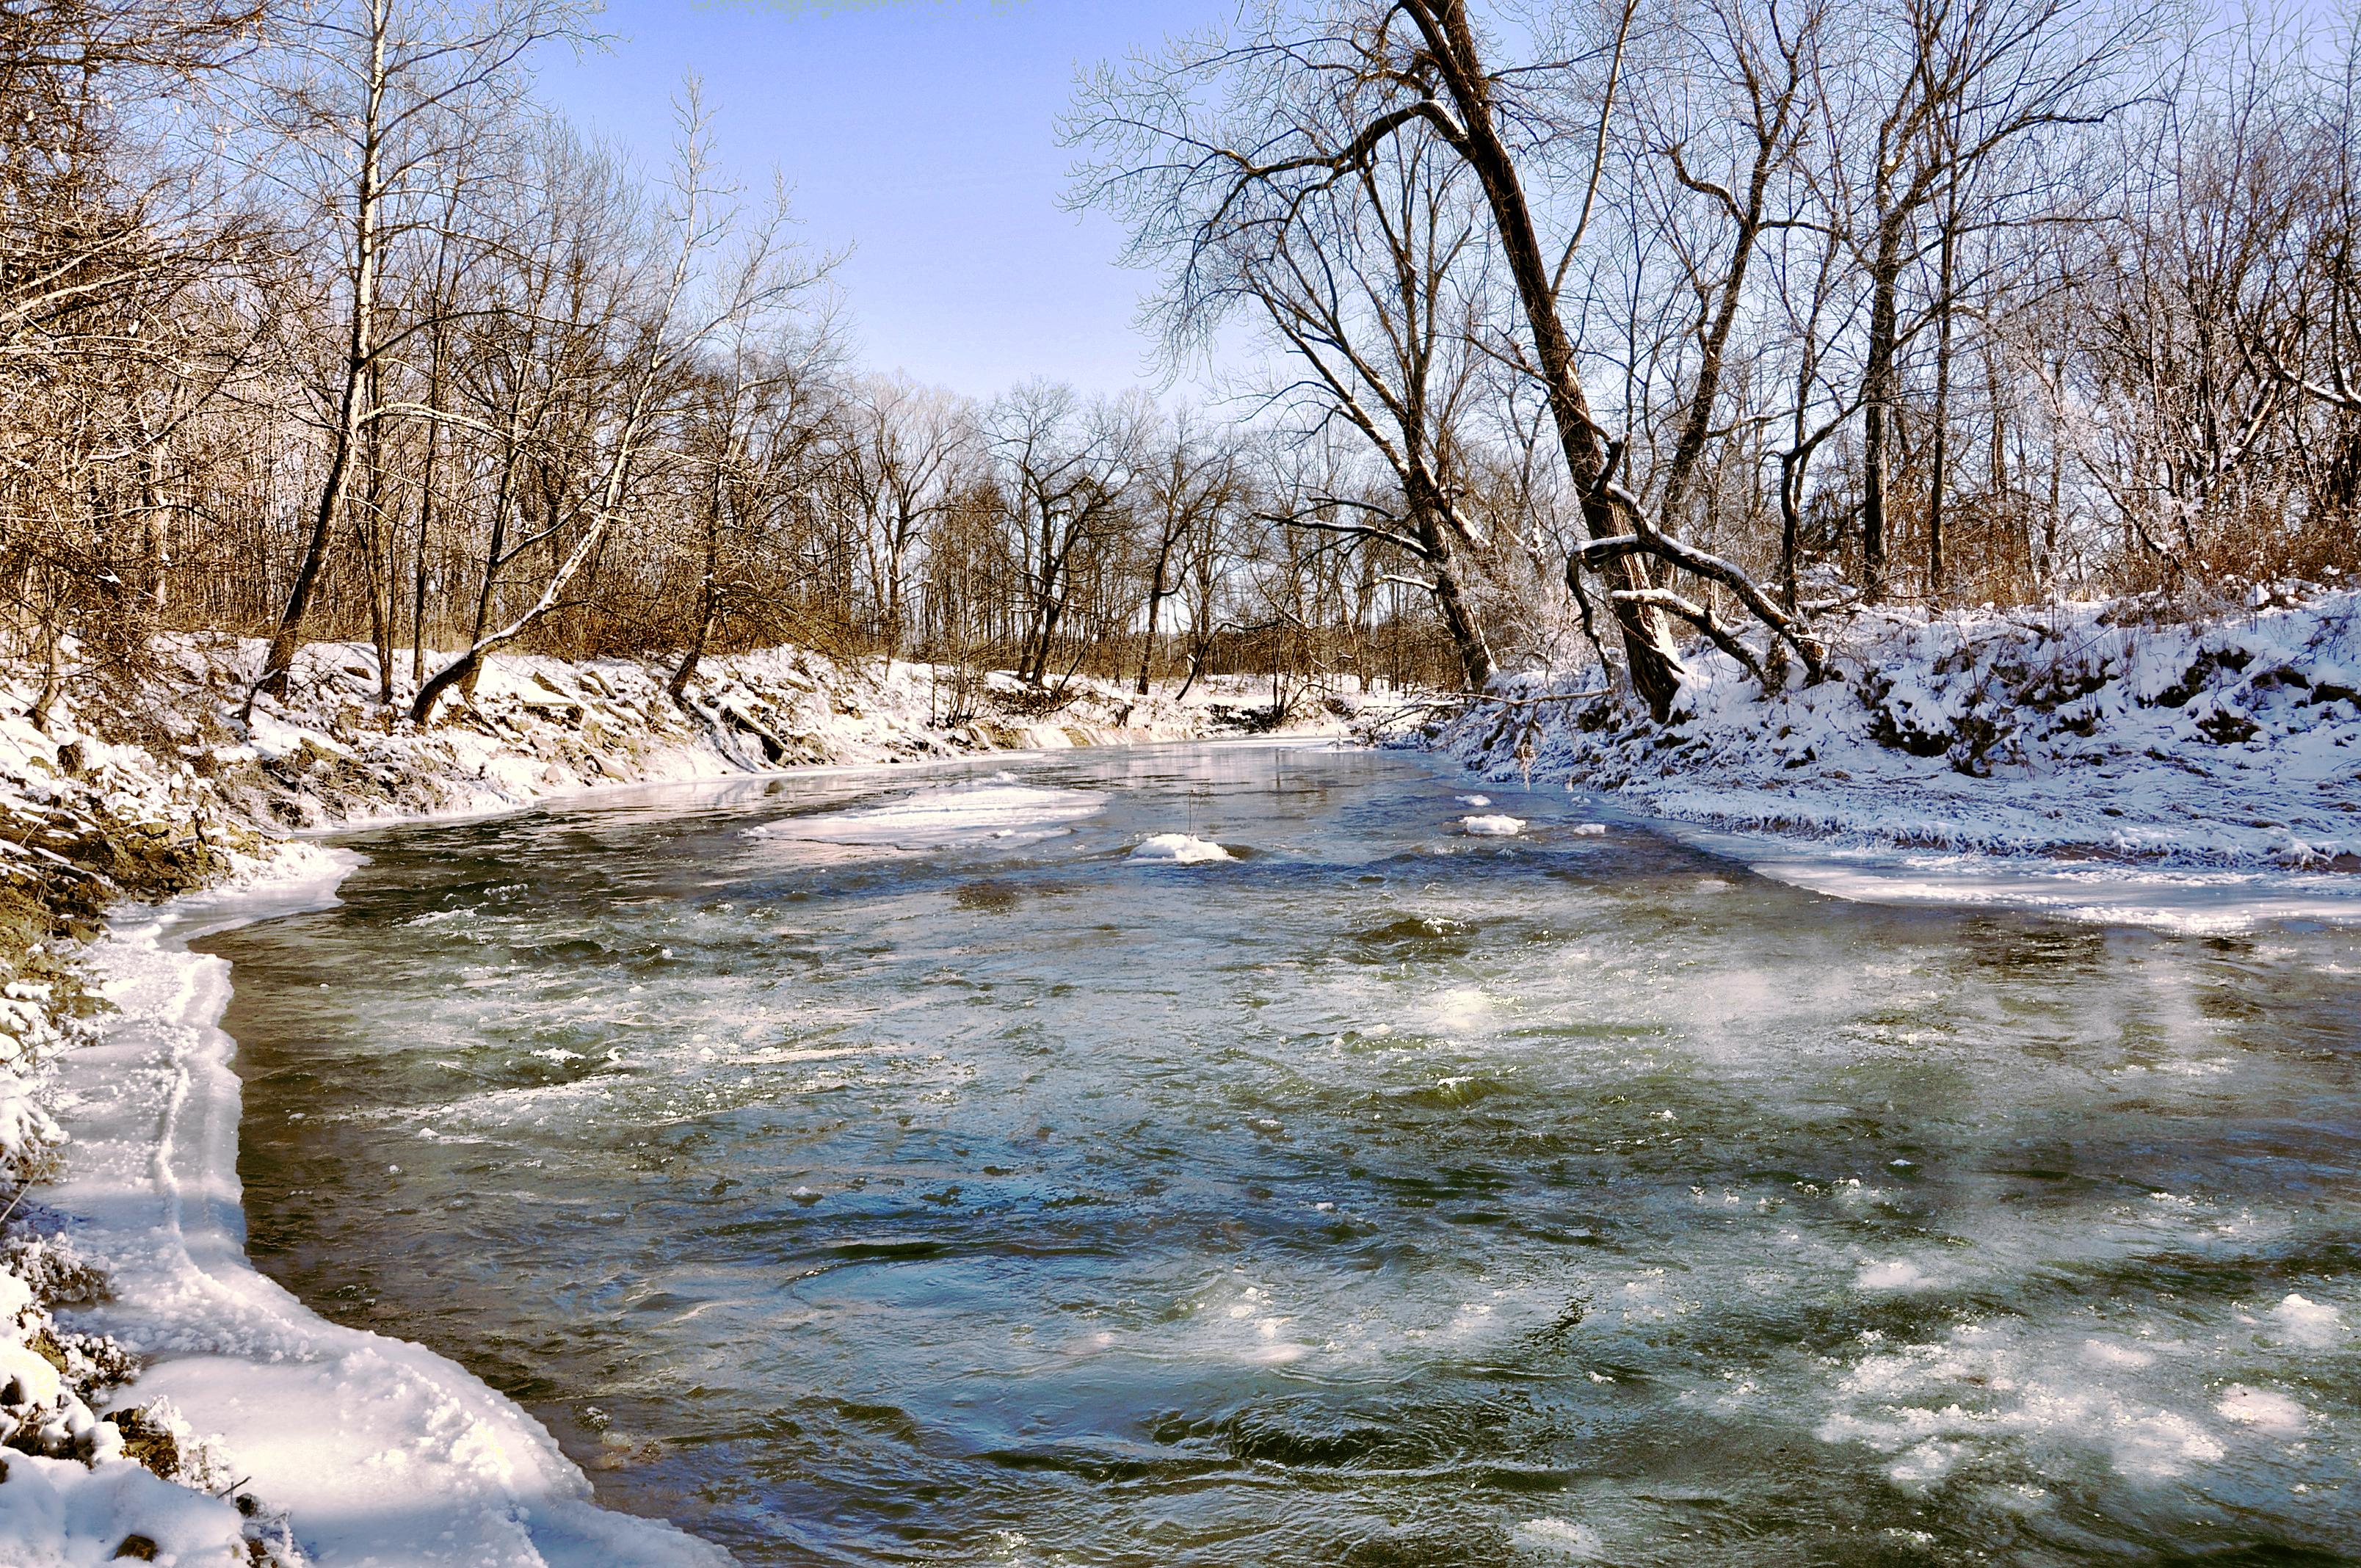 Illinois bureau county princeton - County Bridge Winter Red Snow Nature Creek Us Illinois Big Bureau Covered Princeton Nationalregisterofhistoricplaces Peoriagalenatrail